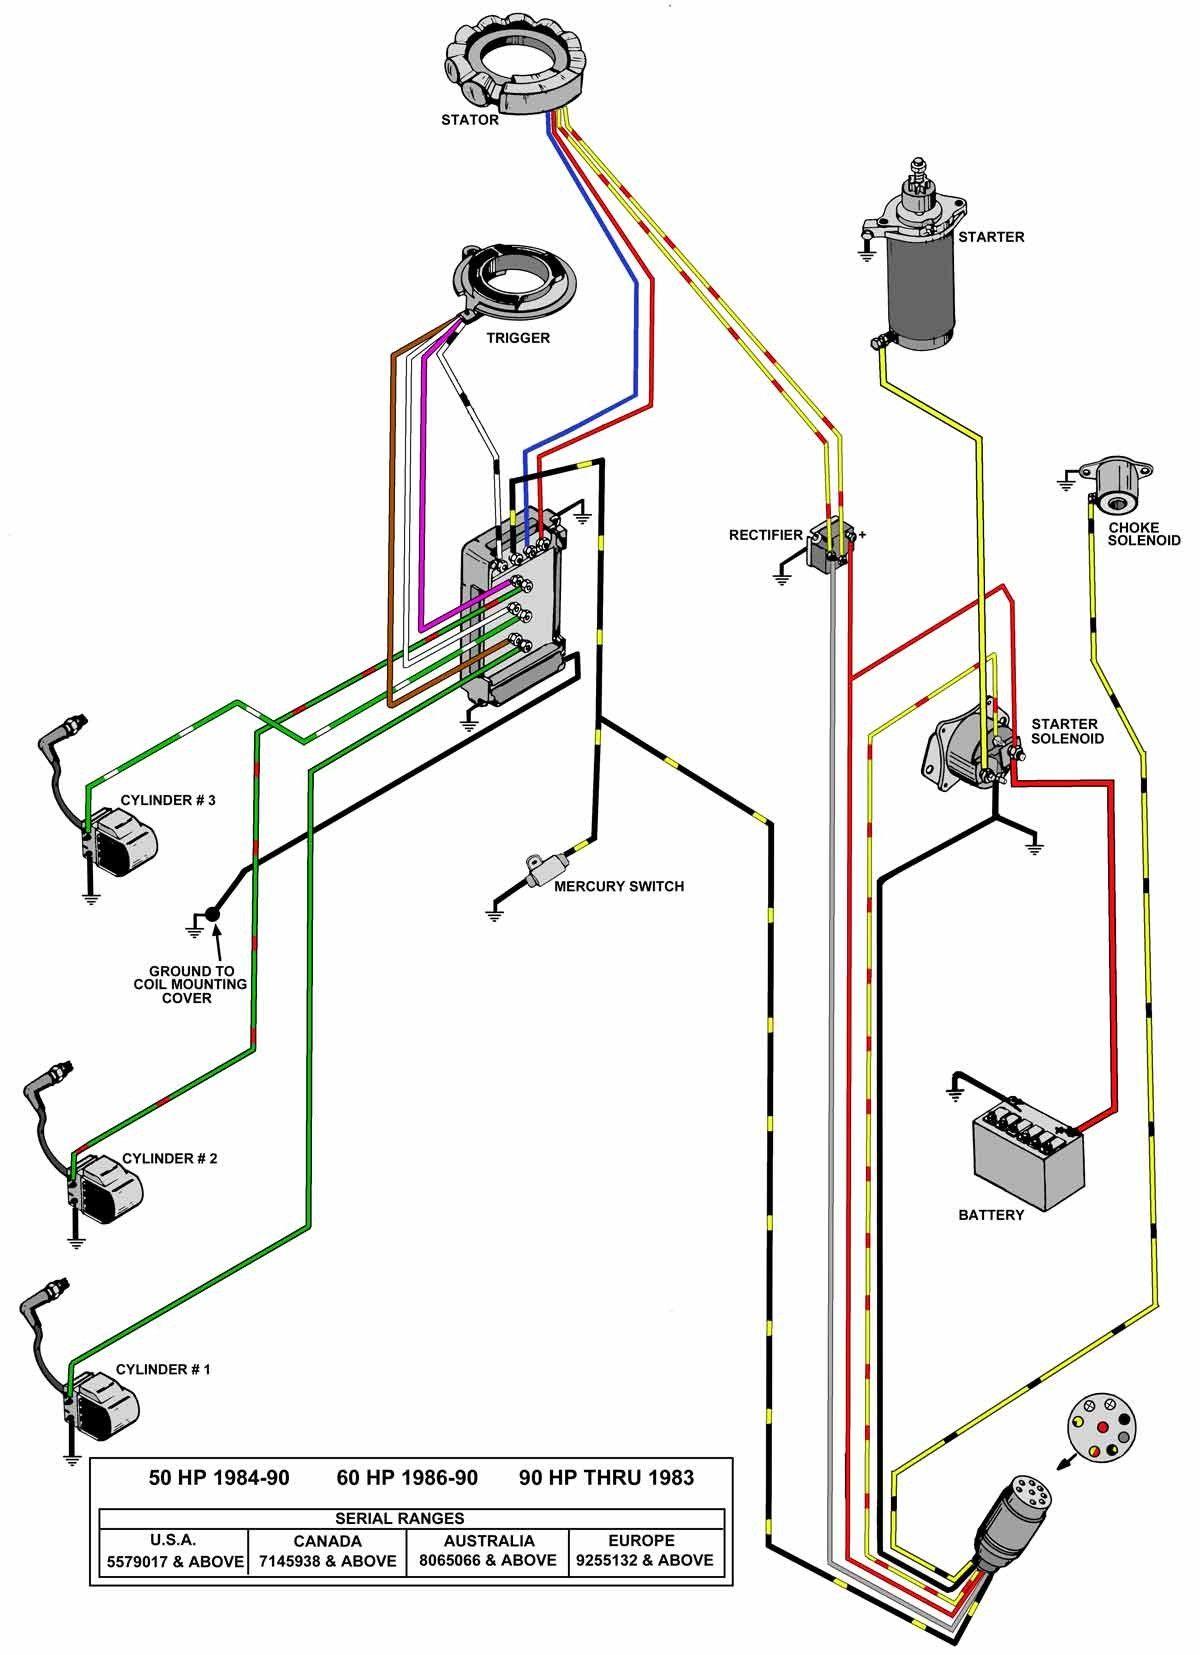 40 Hp Mercury Outboard Wiring Diagram Hecho Electrical Wire Symbol 2020 Arac